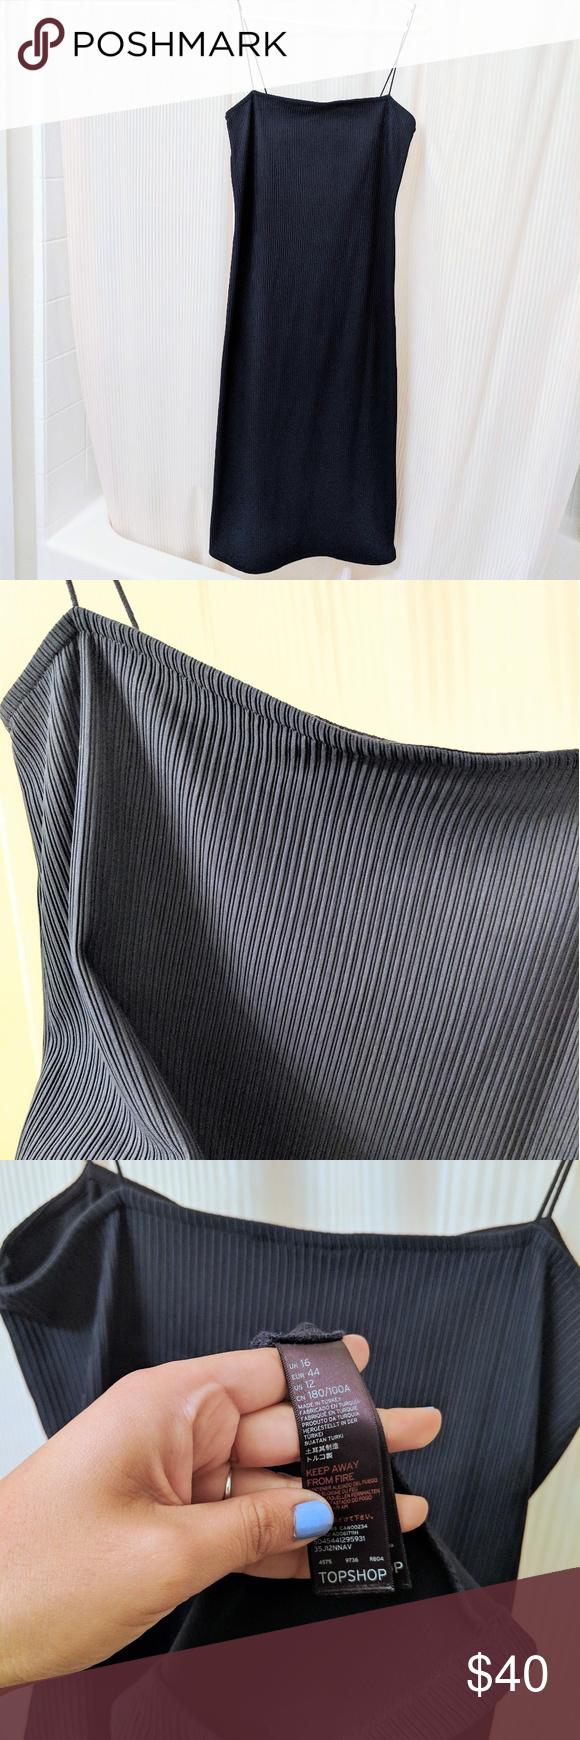 252c4c30b1 TOPSHOP Ribbed Strappy Spaghetti Dress RN 125 149 RN 125 149 Gorgeous dress  it's navy blue